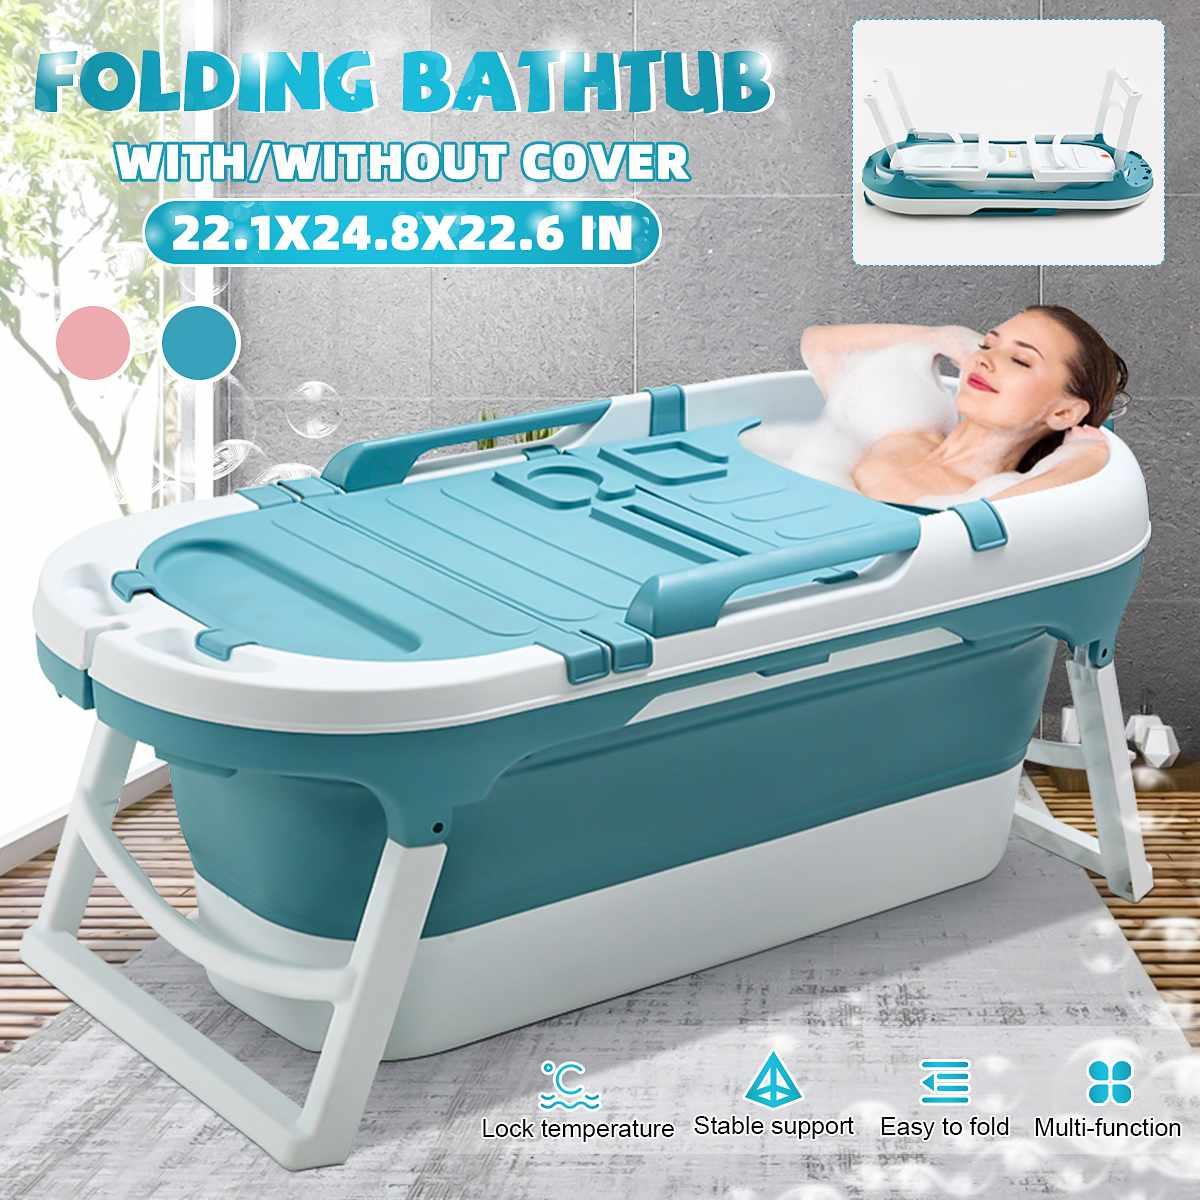 1.4m Large Folding Bath Bucket Adult Tub Baby Children Swimming Pool Barrel Adult Sit Thickened Home Sauna SPA Full Body Tub